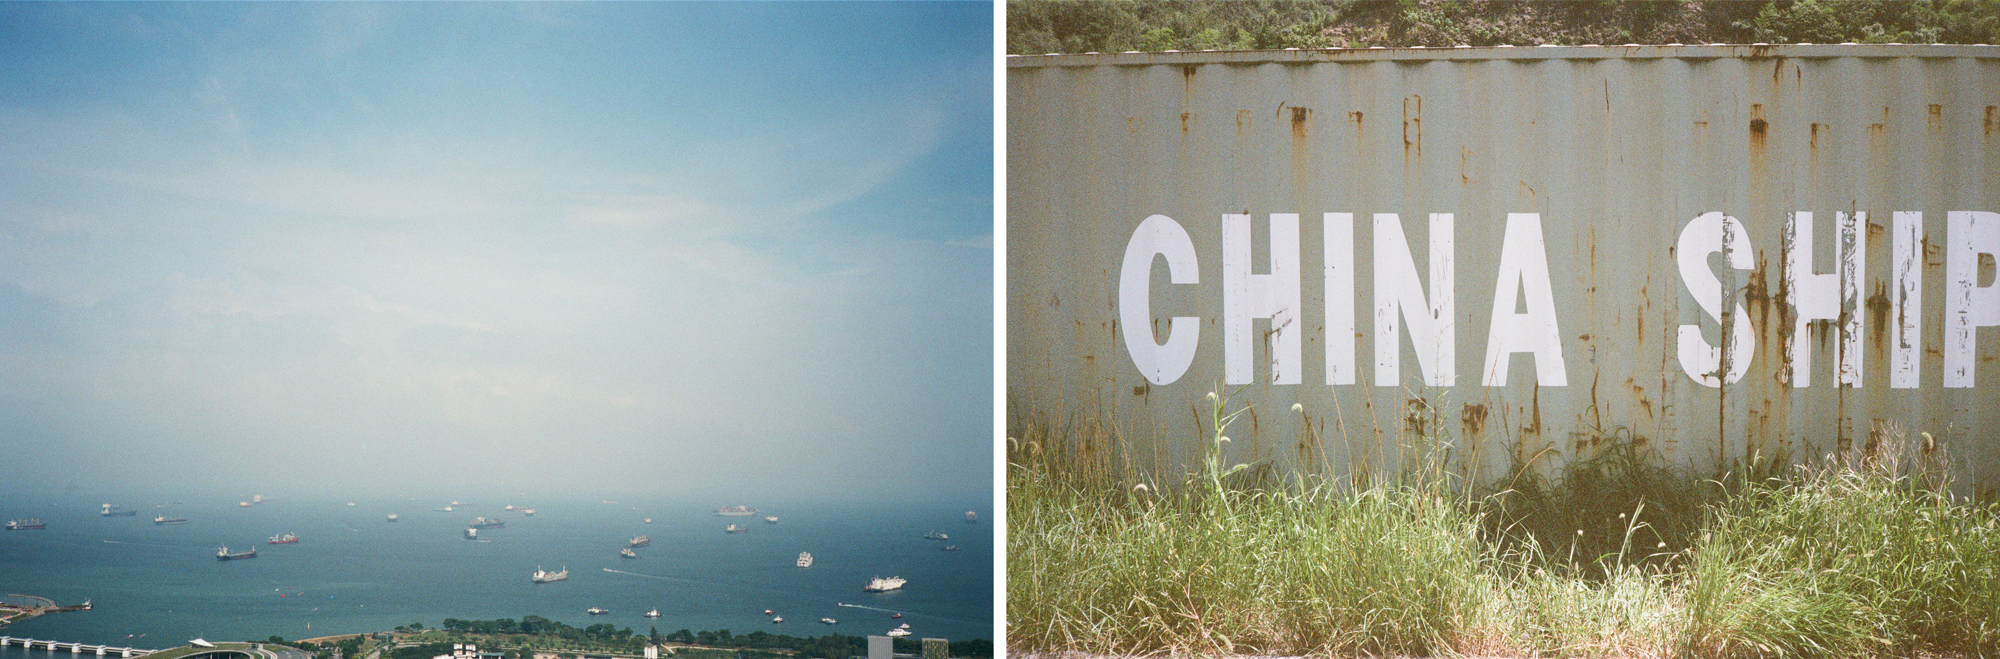 china ship.jpg